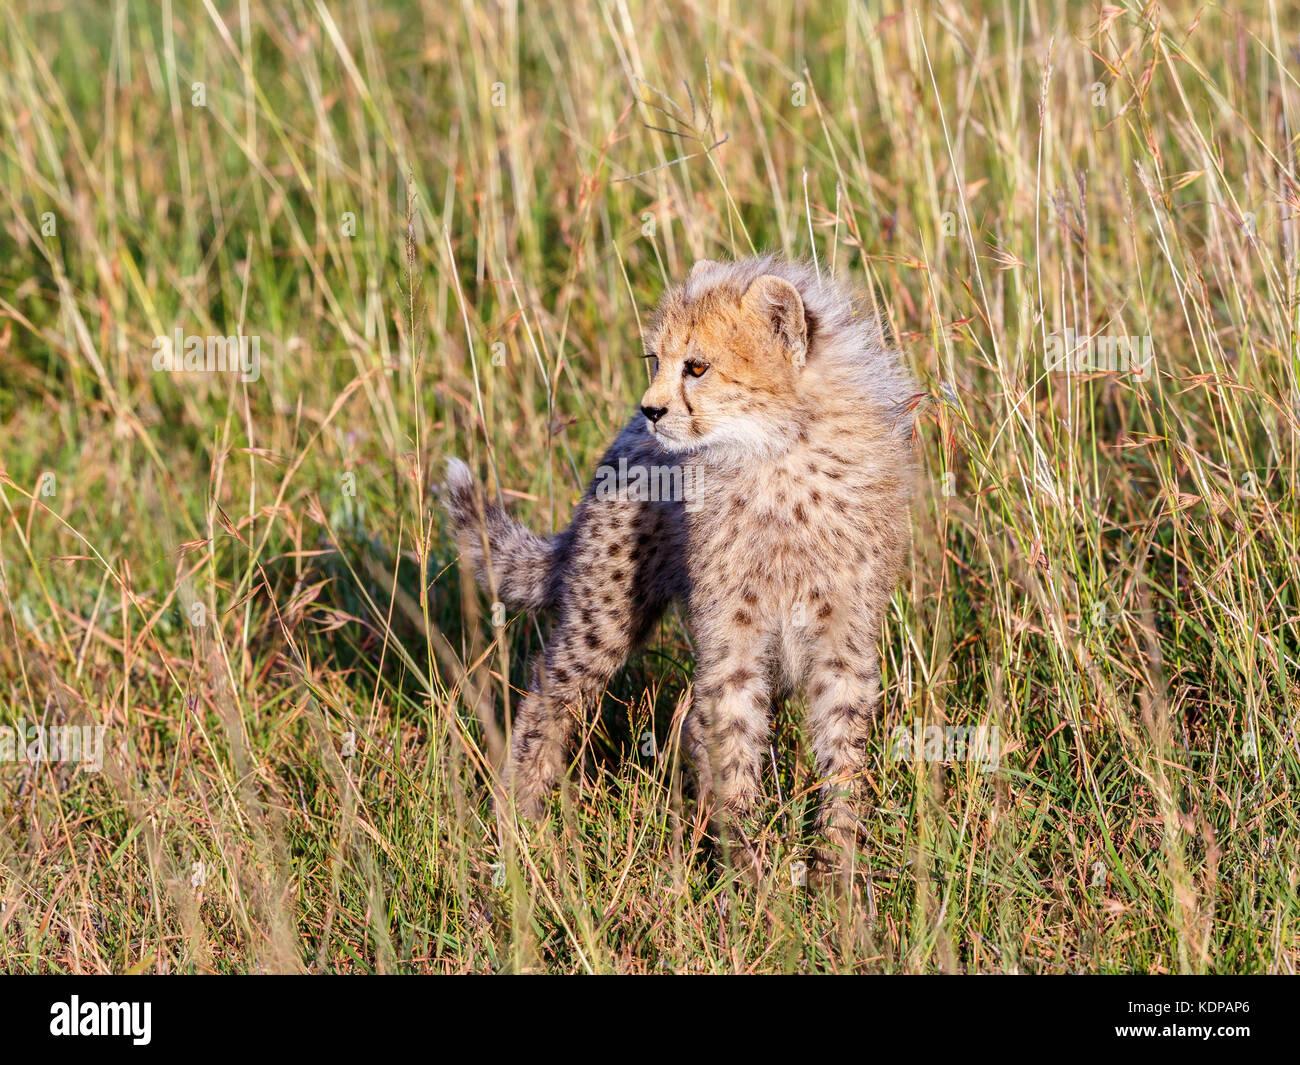 Cheetah cub in the grass of the savannah - Stock Image